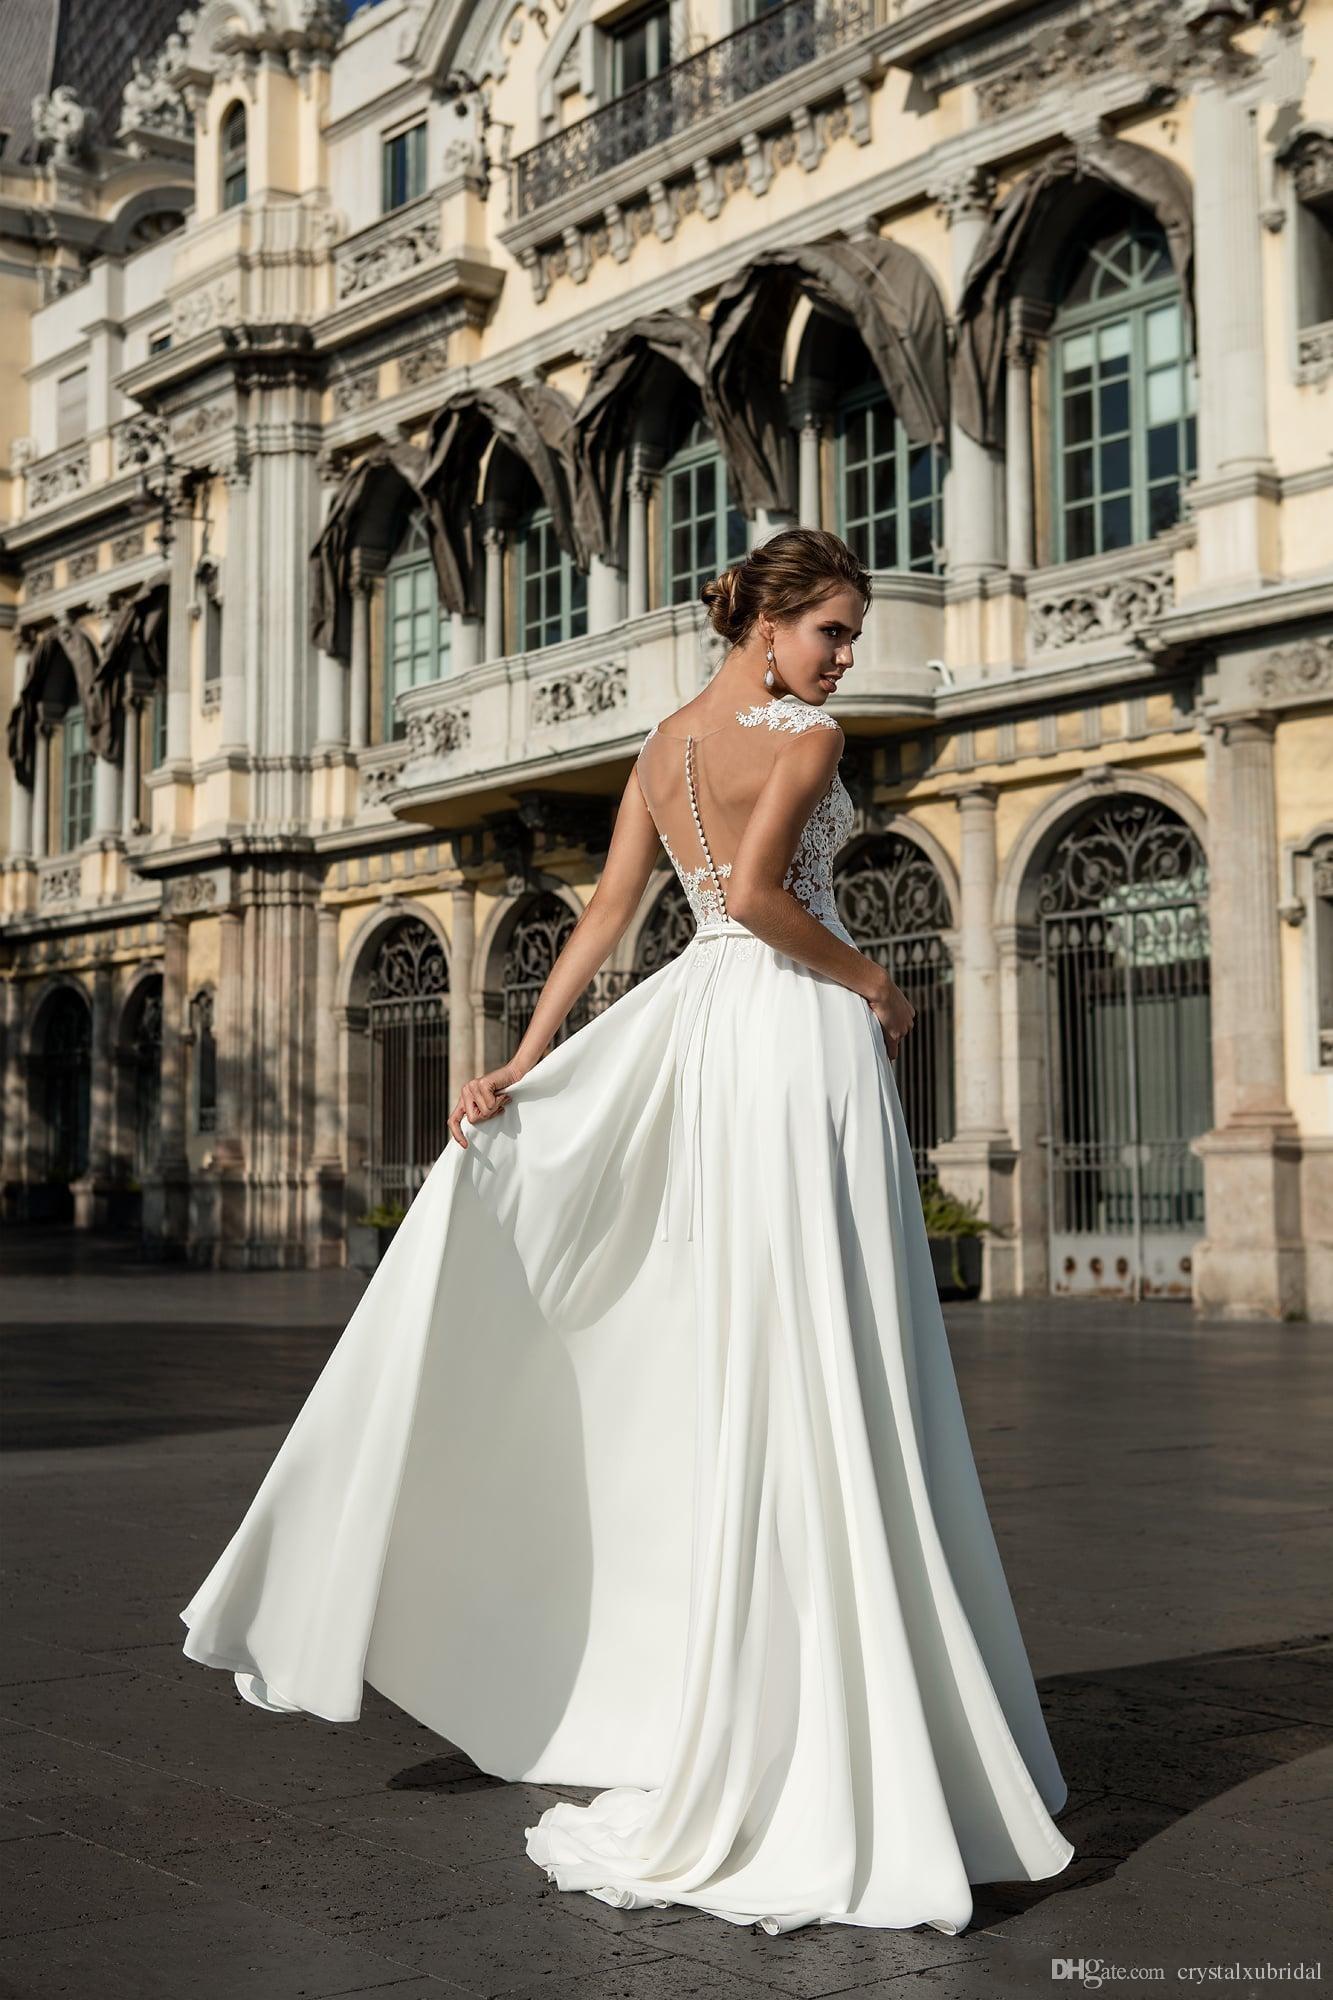 limor-rosen 2018 A Line Wedding Dresses Jewel Neck Illsuion Lace Applique Side Split Sheer Back Floor Length Chiffon Beach Bohe Bridal Gowns